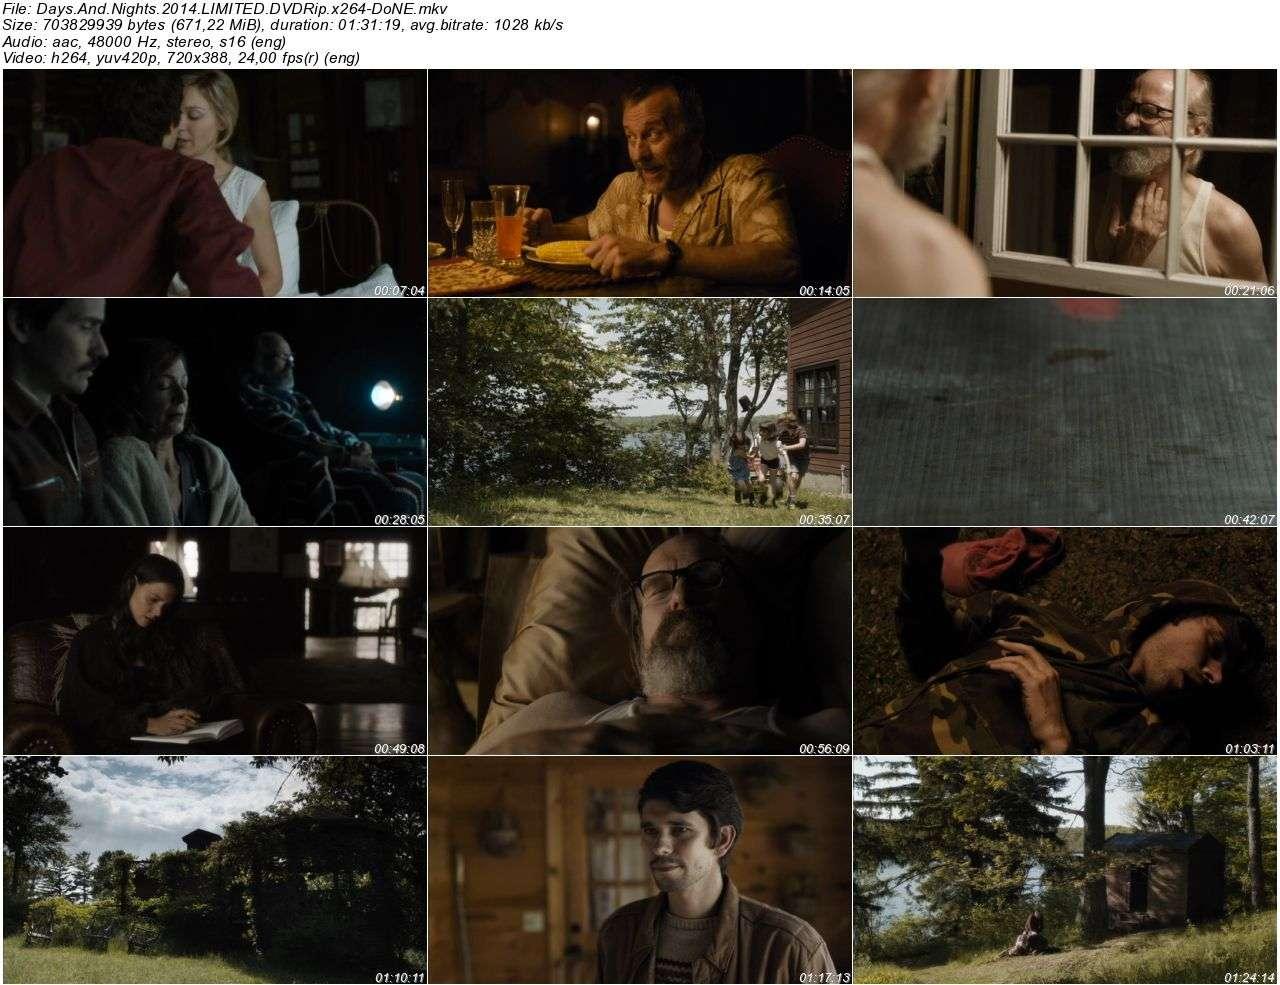 Days And Nights - 2014 DVDRip x264 - Türkçe Altyazılı Tek Link indir